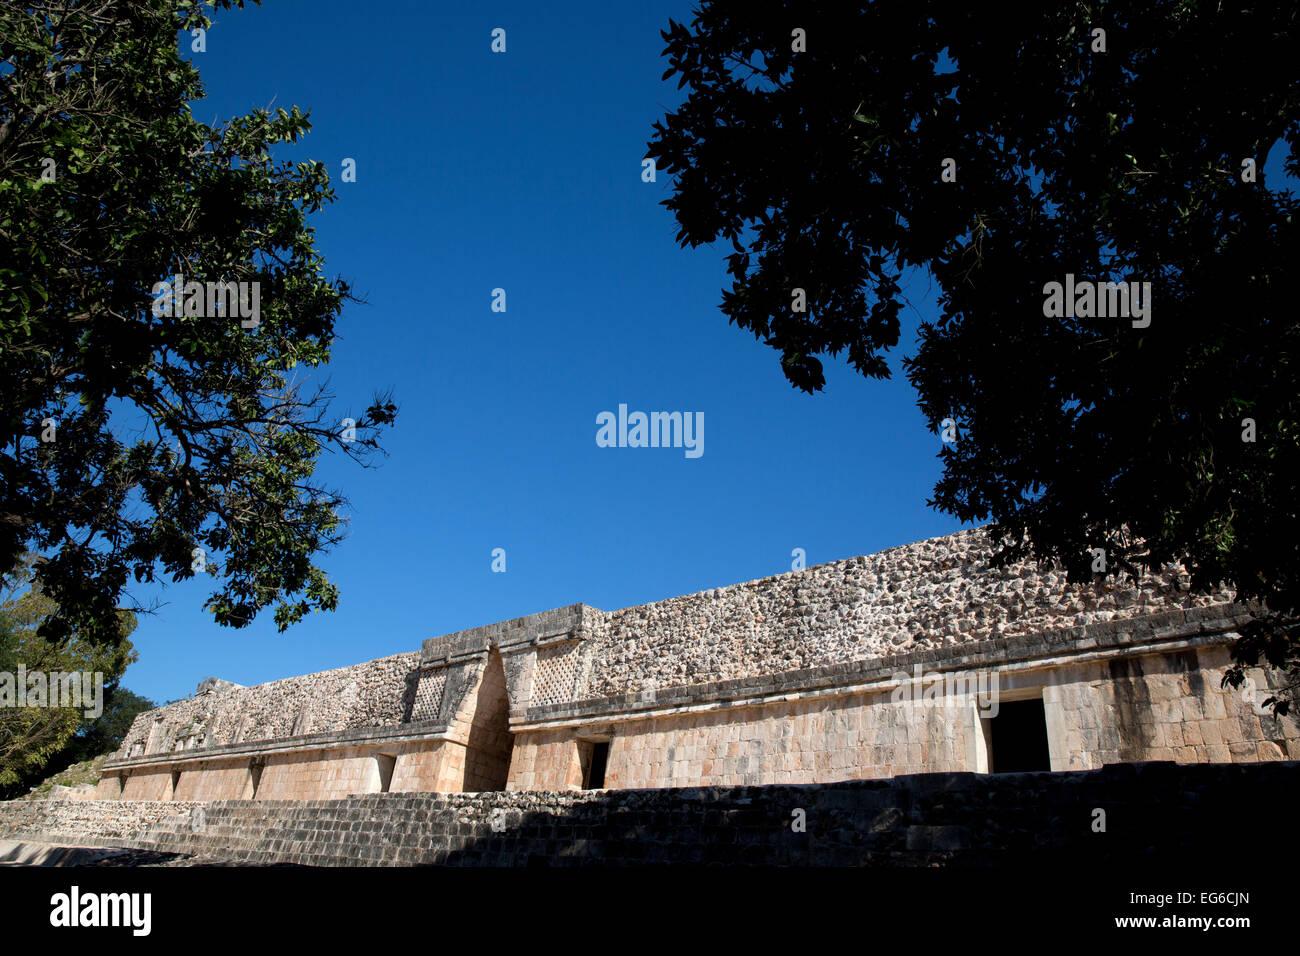 Ornate facade, Nunnery quadrangle, Uxmal, Yucatan, Mexico Stock Photo